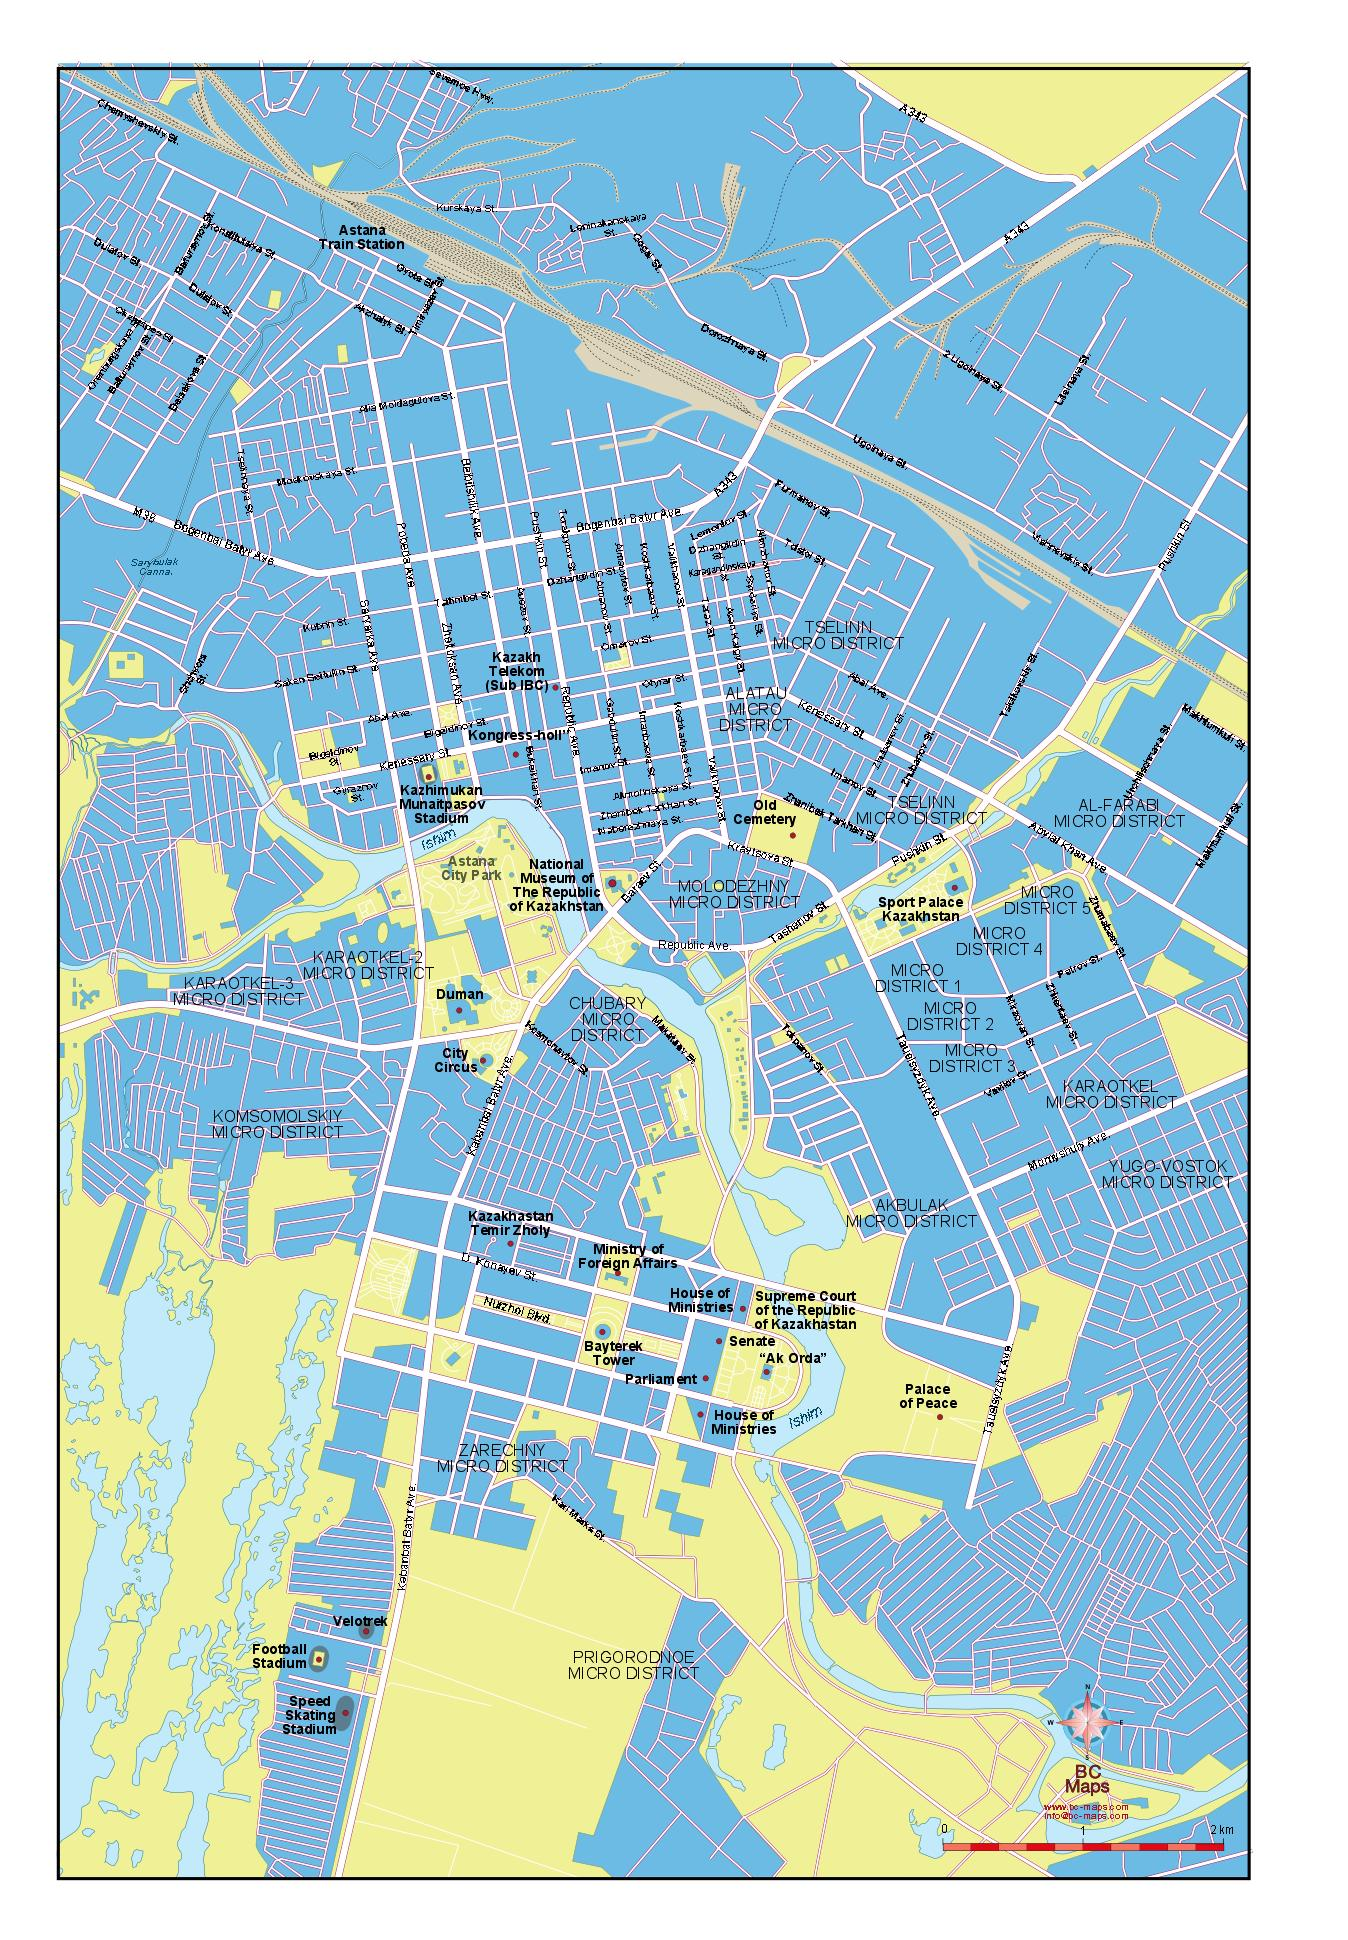 Astana Vector city maps eps illustrator freehand Corel draw